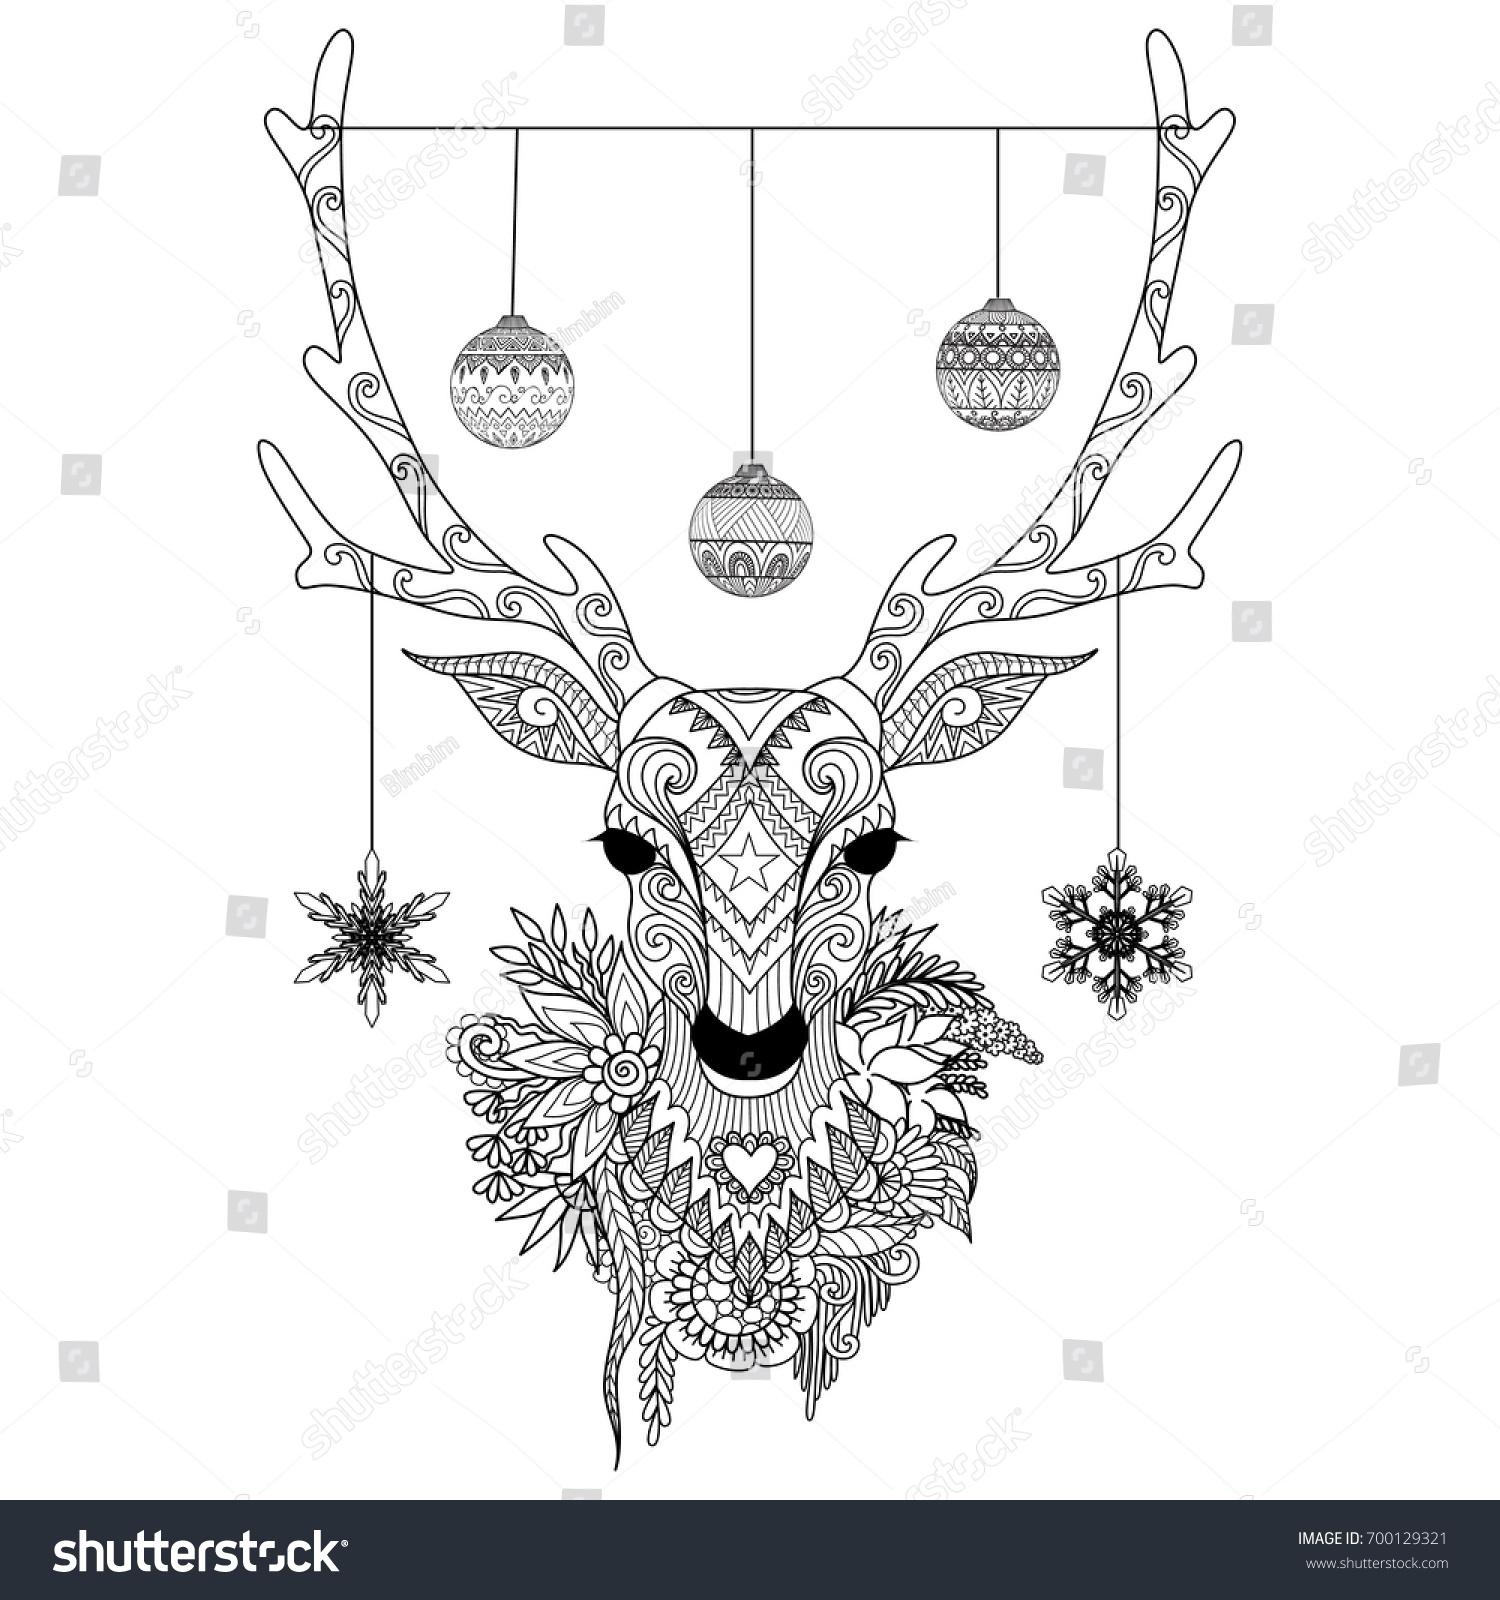 Line Art Printing And Design : Line art design christmas balls snowflakes stock vector